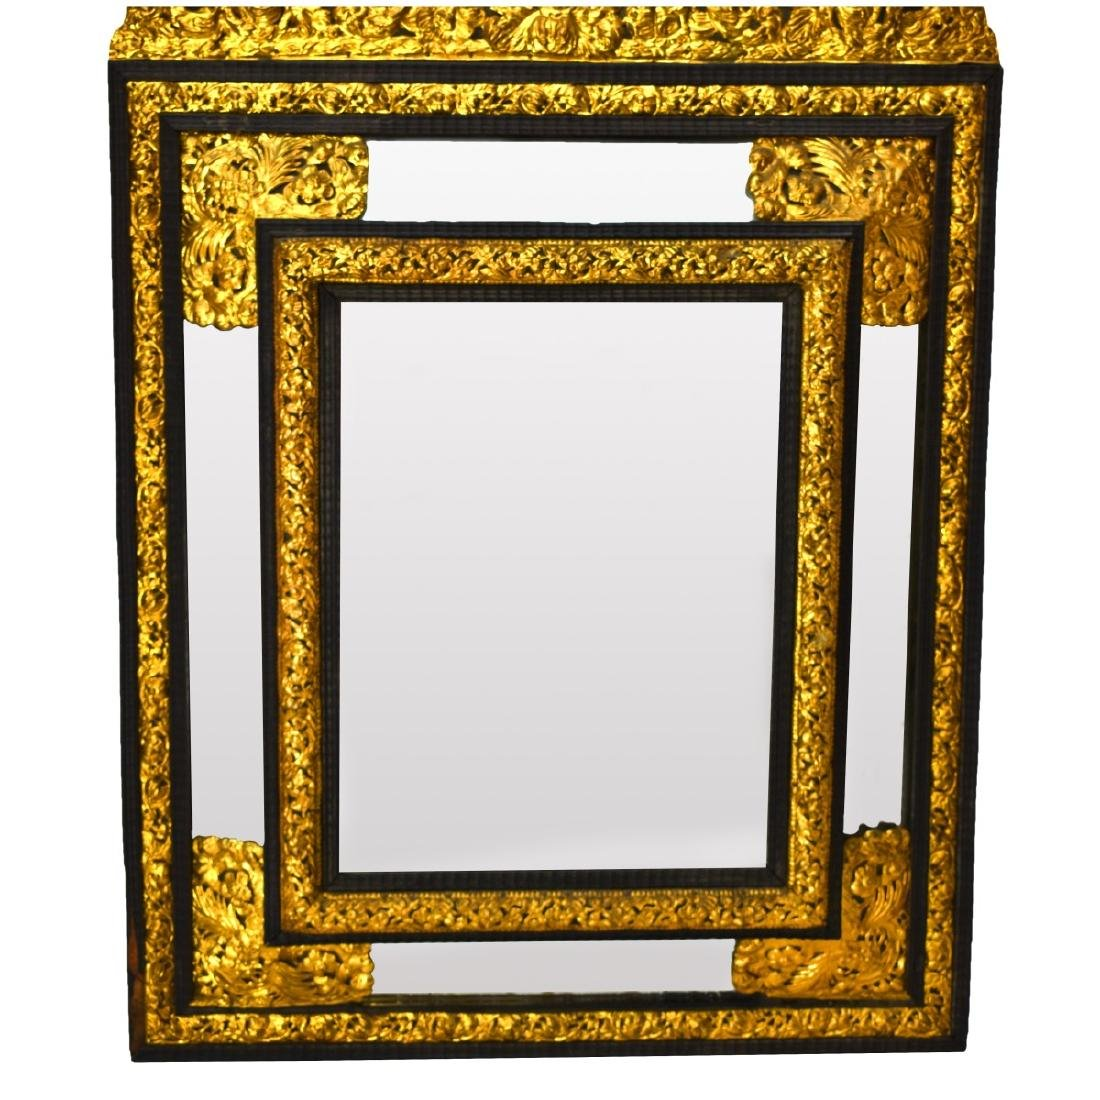 Large French Napoleon II Style Cushion Mirror - 2